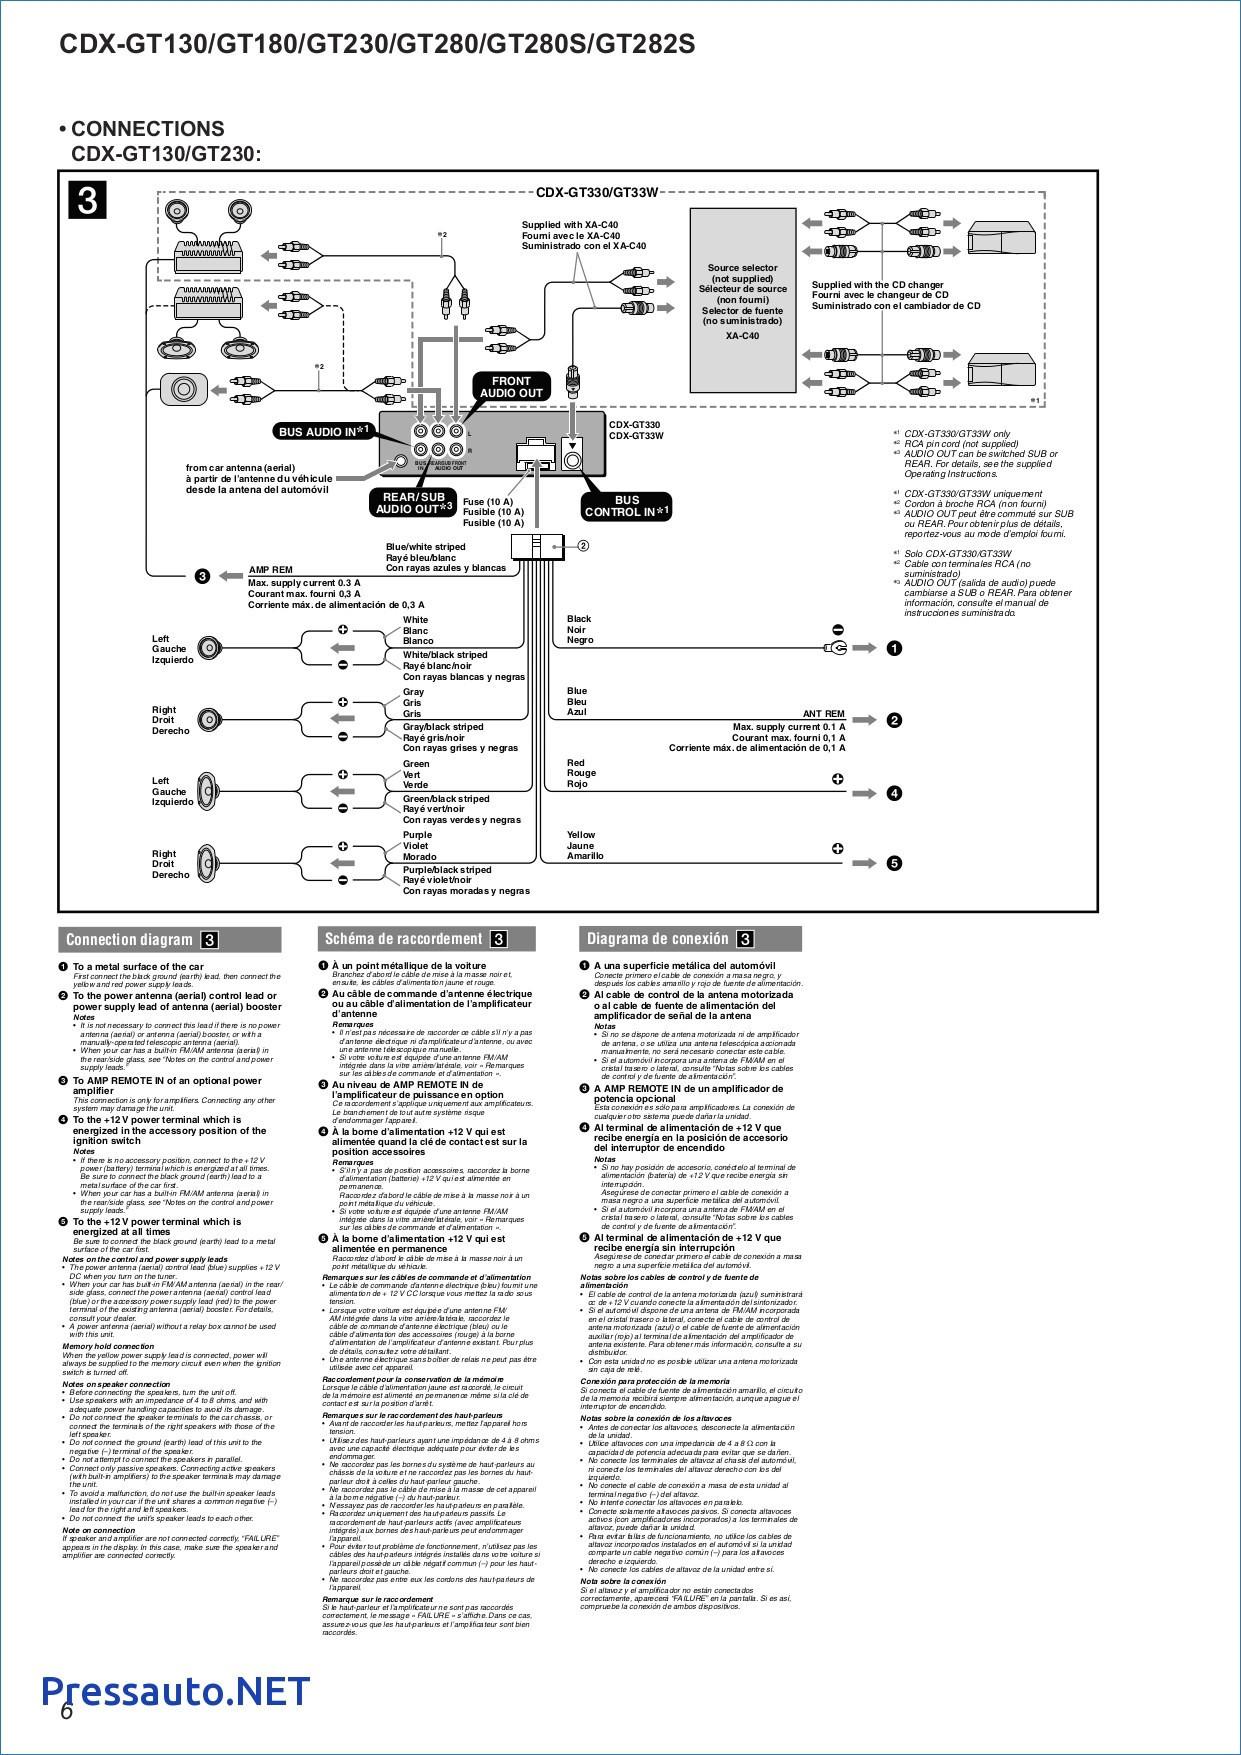 sony cdx gt260mp wiring diagram radio wire data inspirational sony cdx  gt260mp wiring diagram wiring diagram